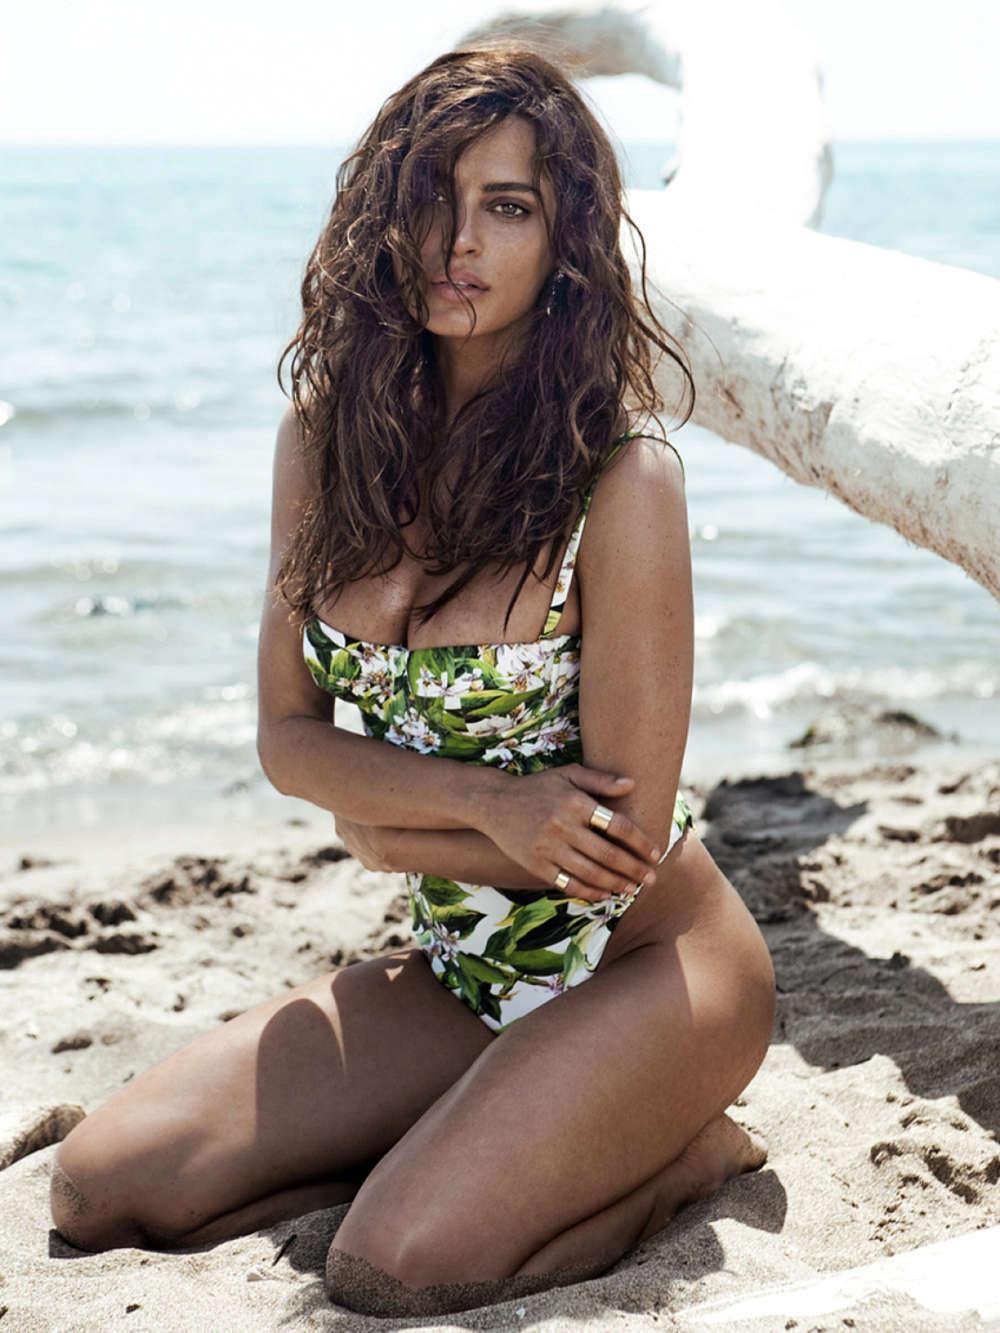 Bikini Catrinel Menghia nudes (75 photo), Topless, Hot, Twitter, see through 2019